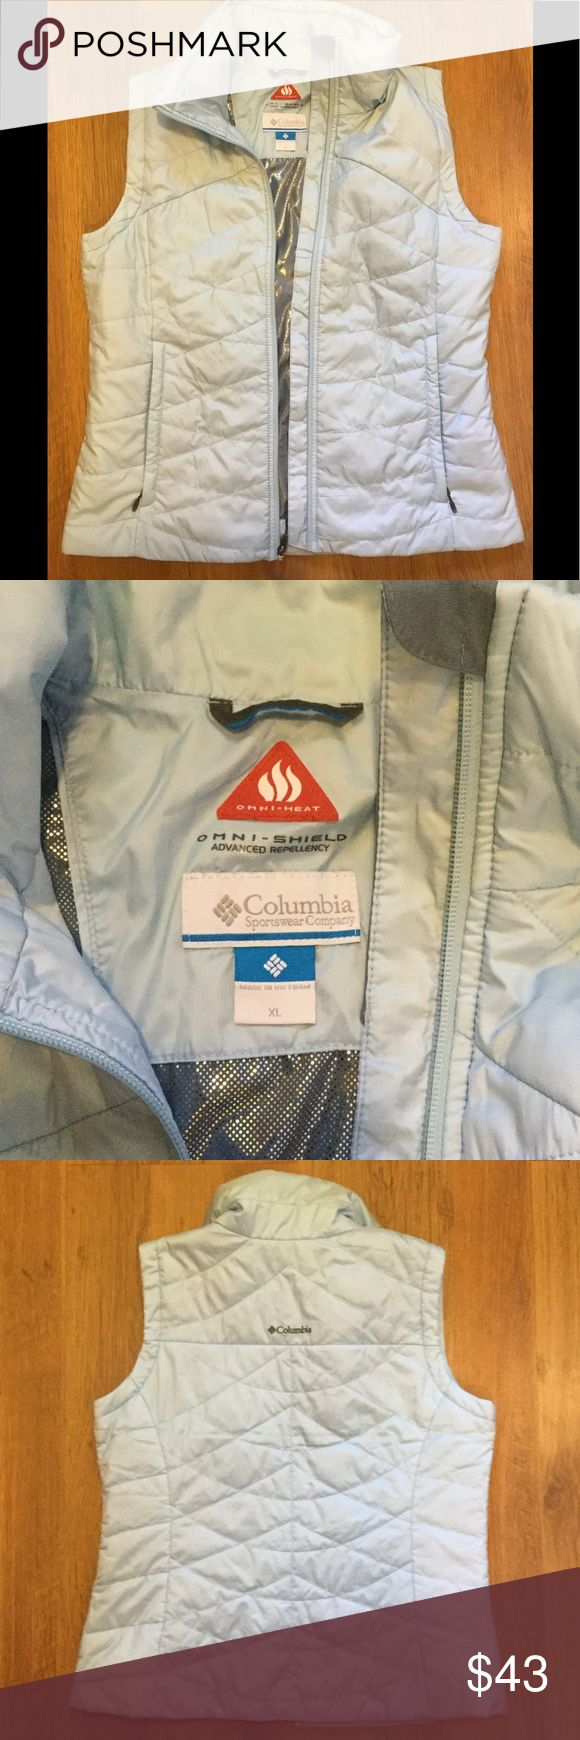 Columbia Omni-Heat XL Vest Great for fall! Light blue XL vest from Columbia. Lightly used. Columbia Jackets & Coats Vests